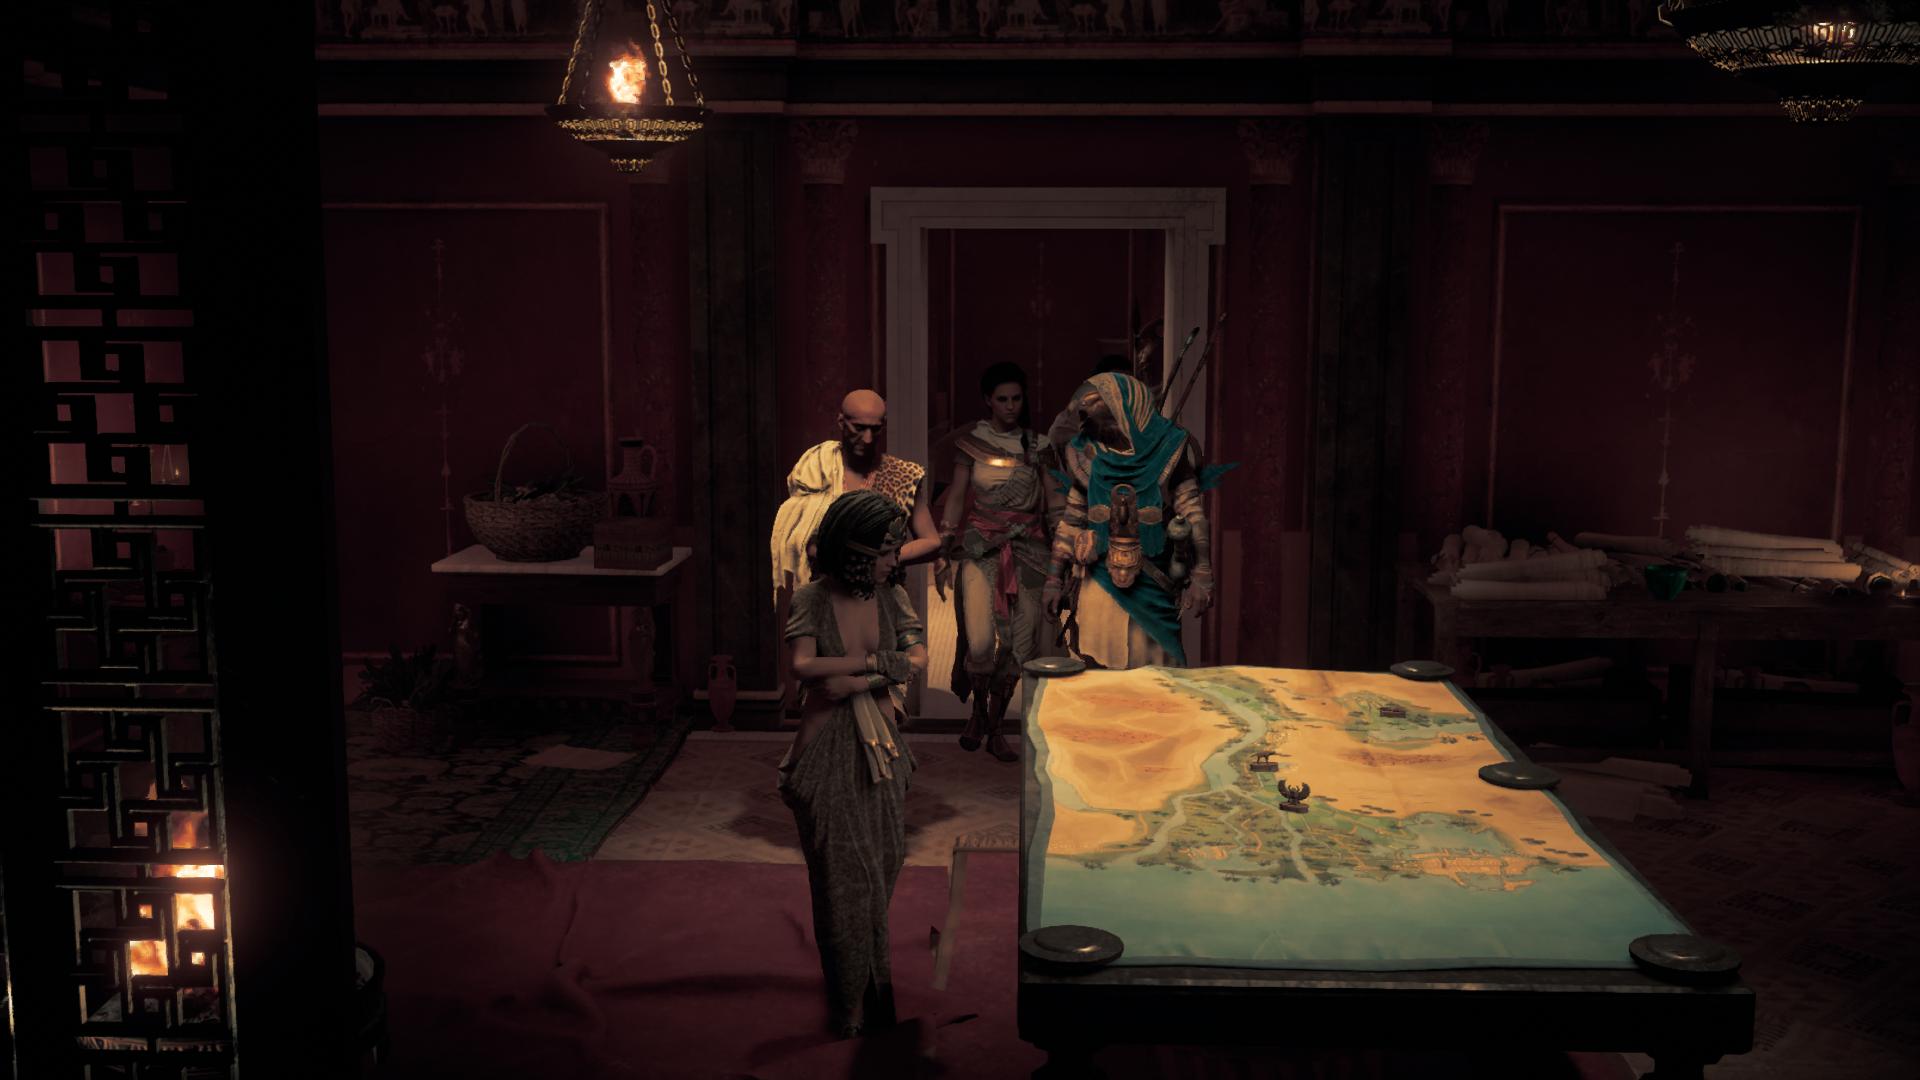 Assassin-s-Creed-Origins2021-3-28-20-16-53.png